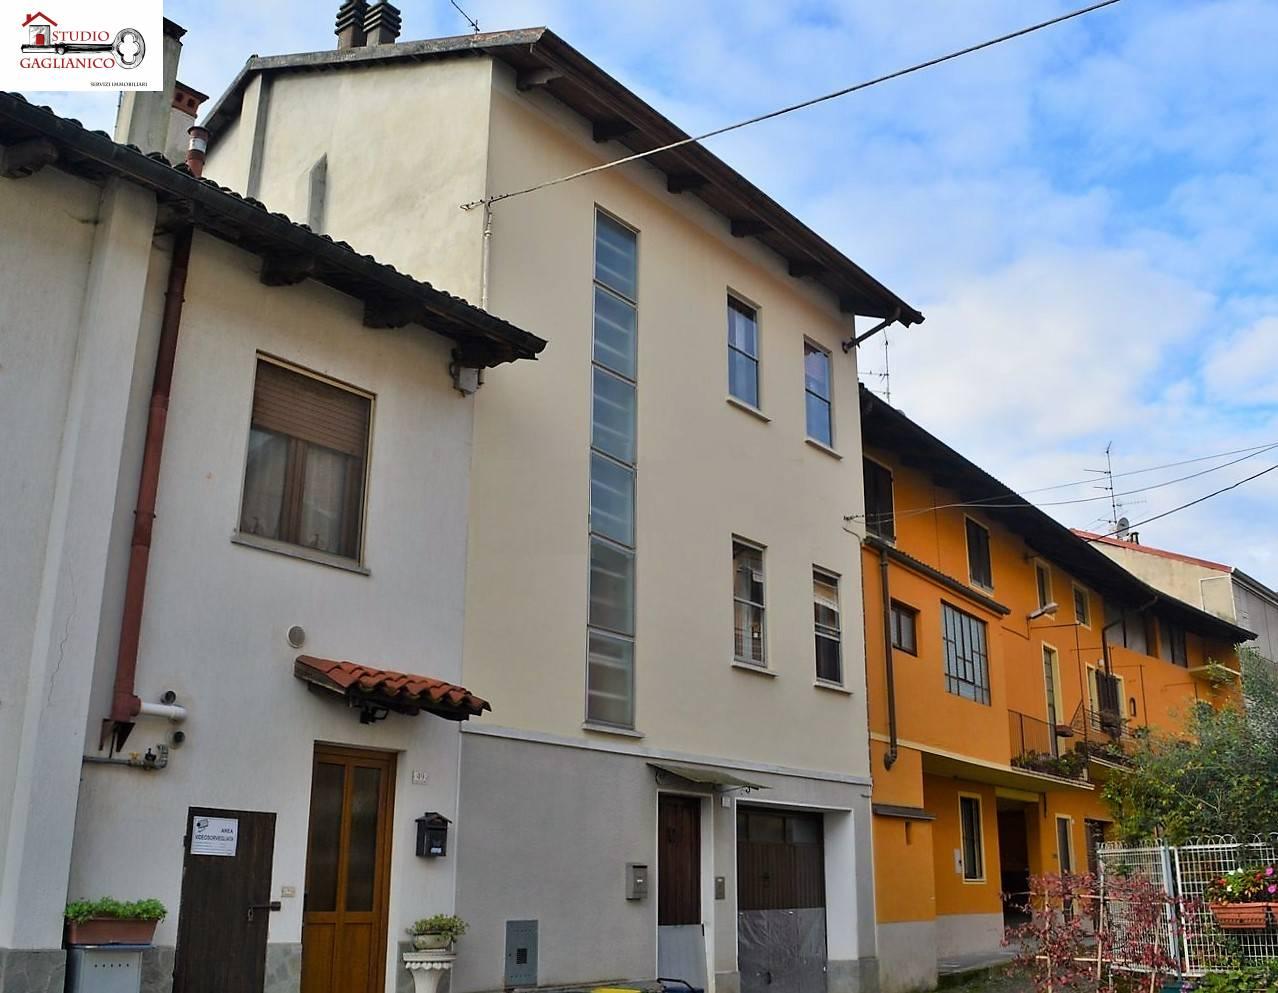 Casa semi-indipendente in vendita a Mongrando (BI)